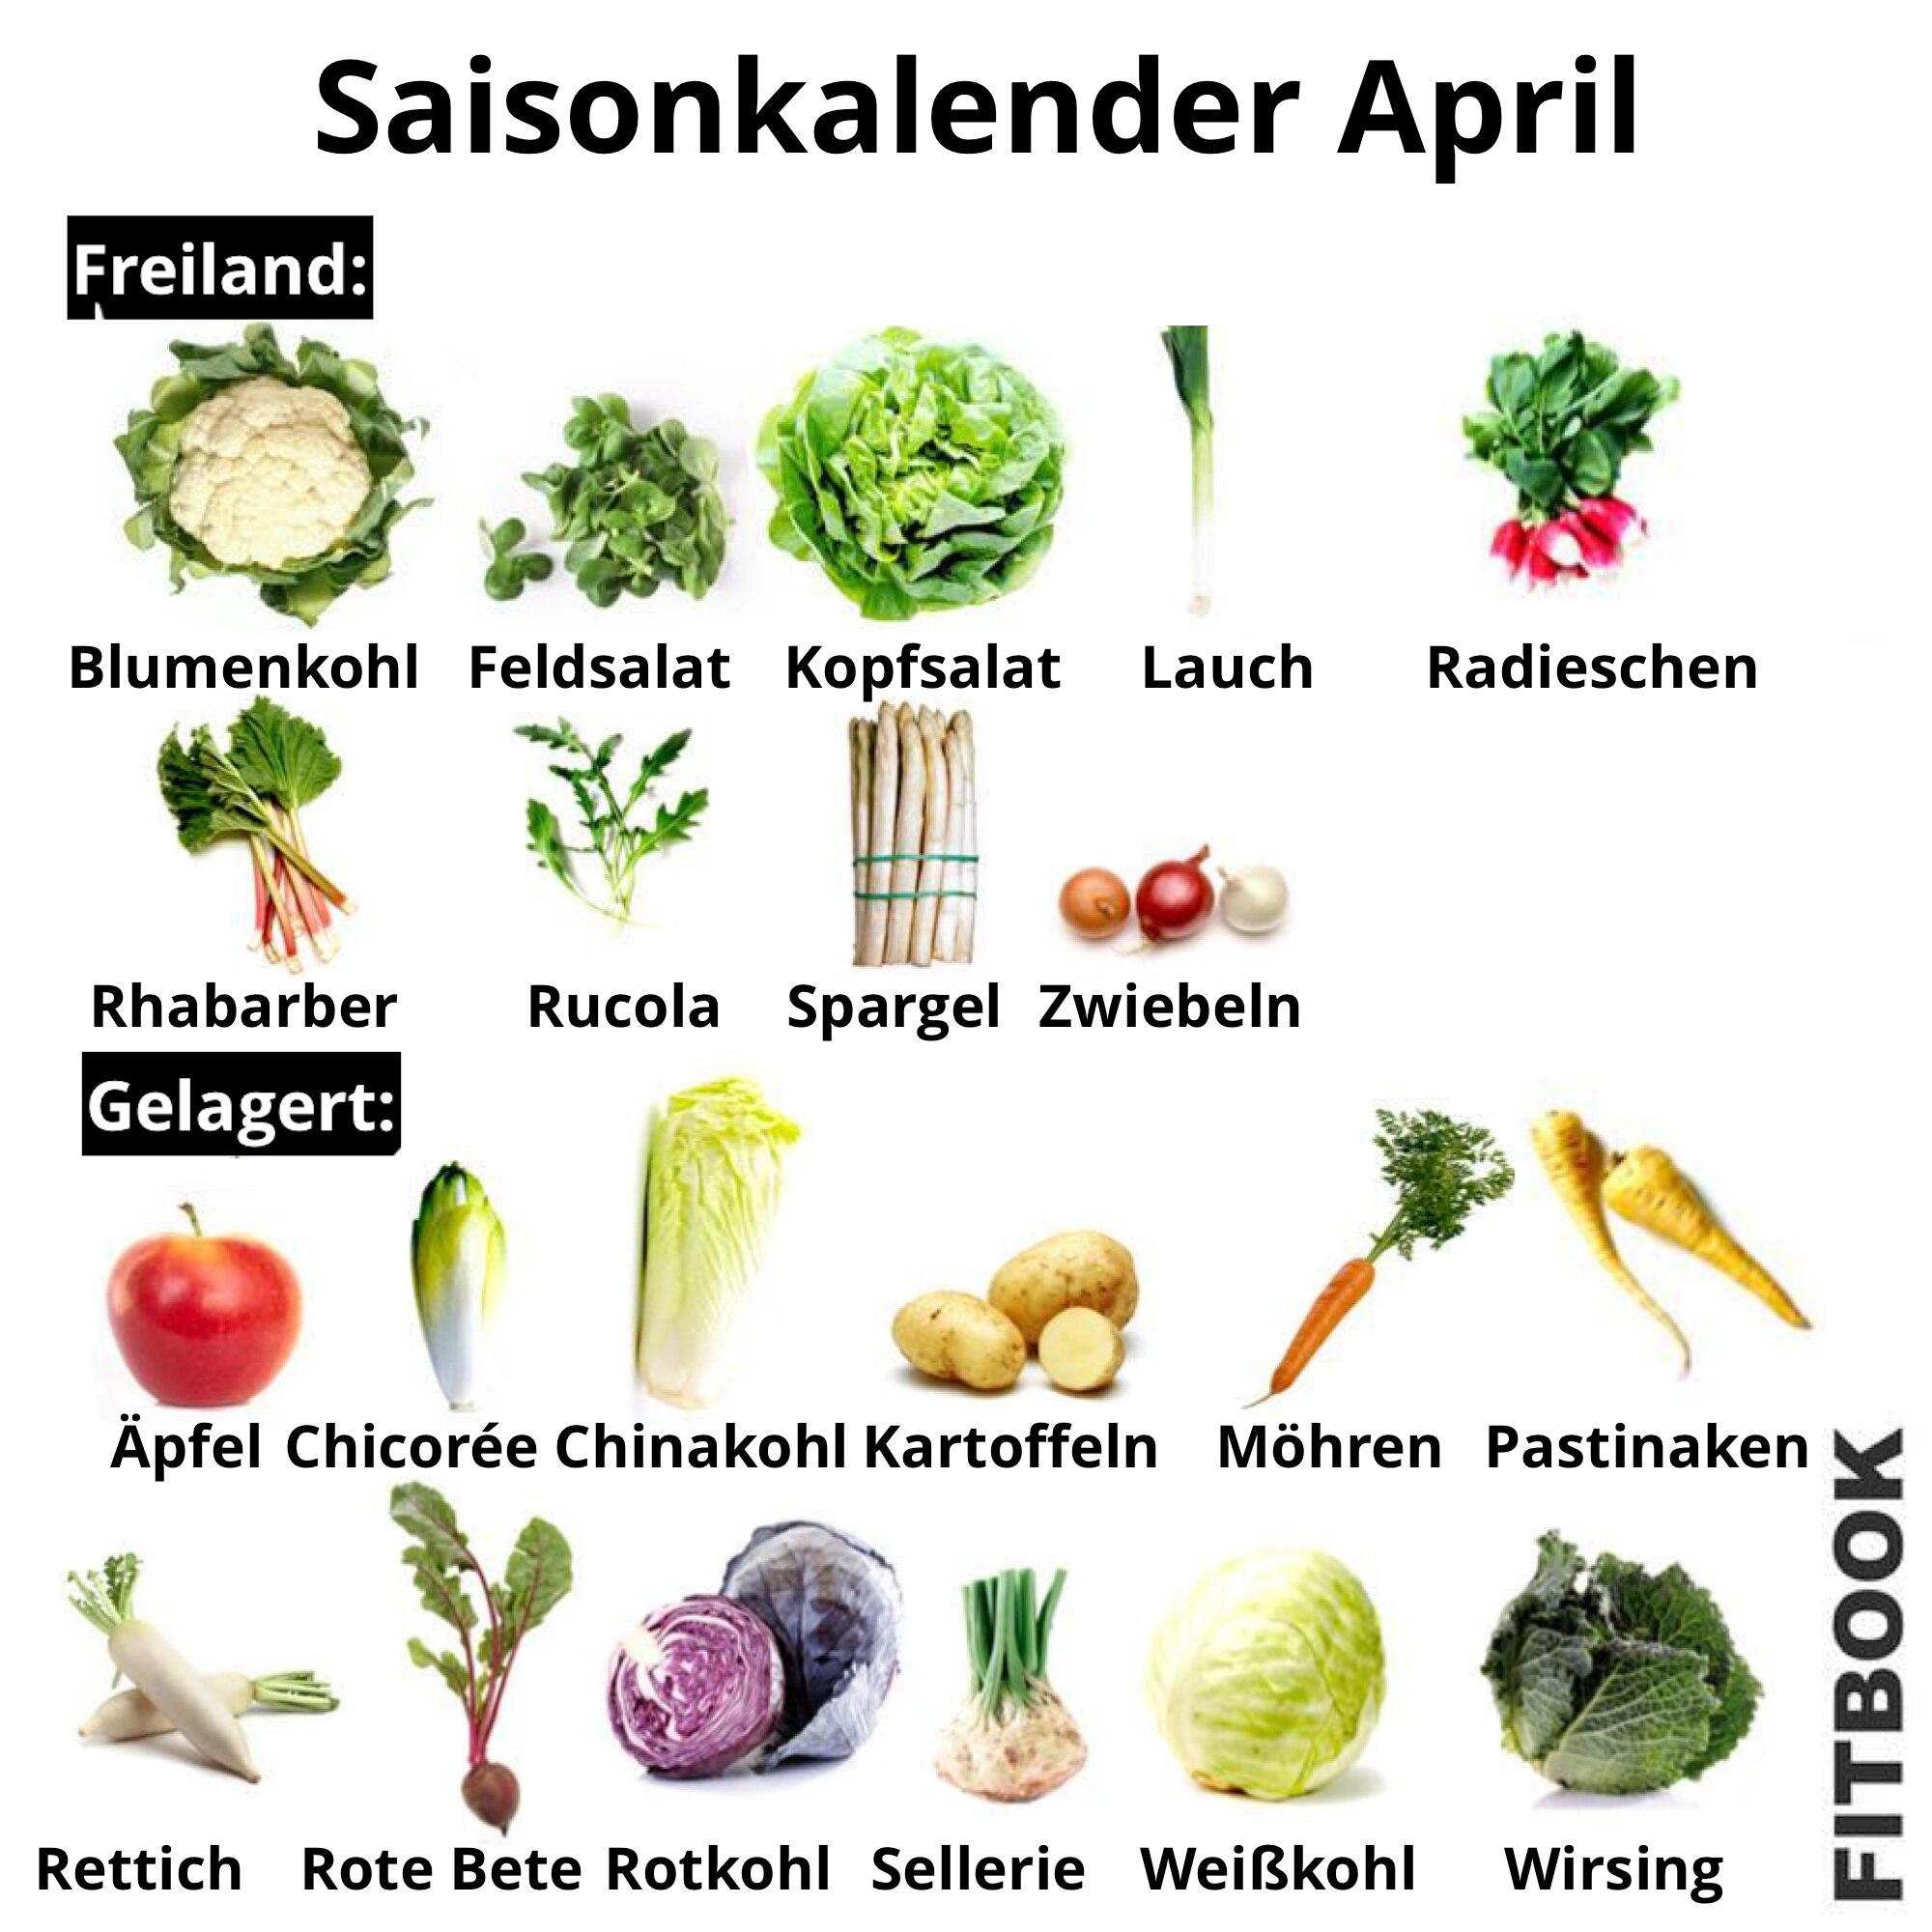 Saisonkalender April